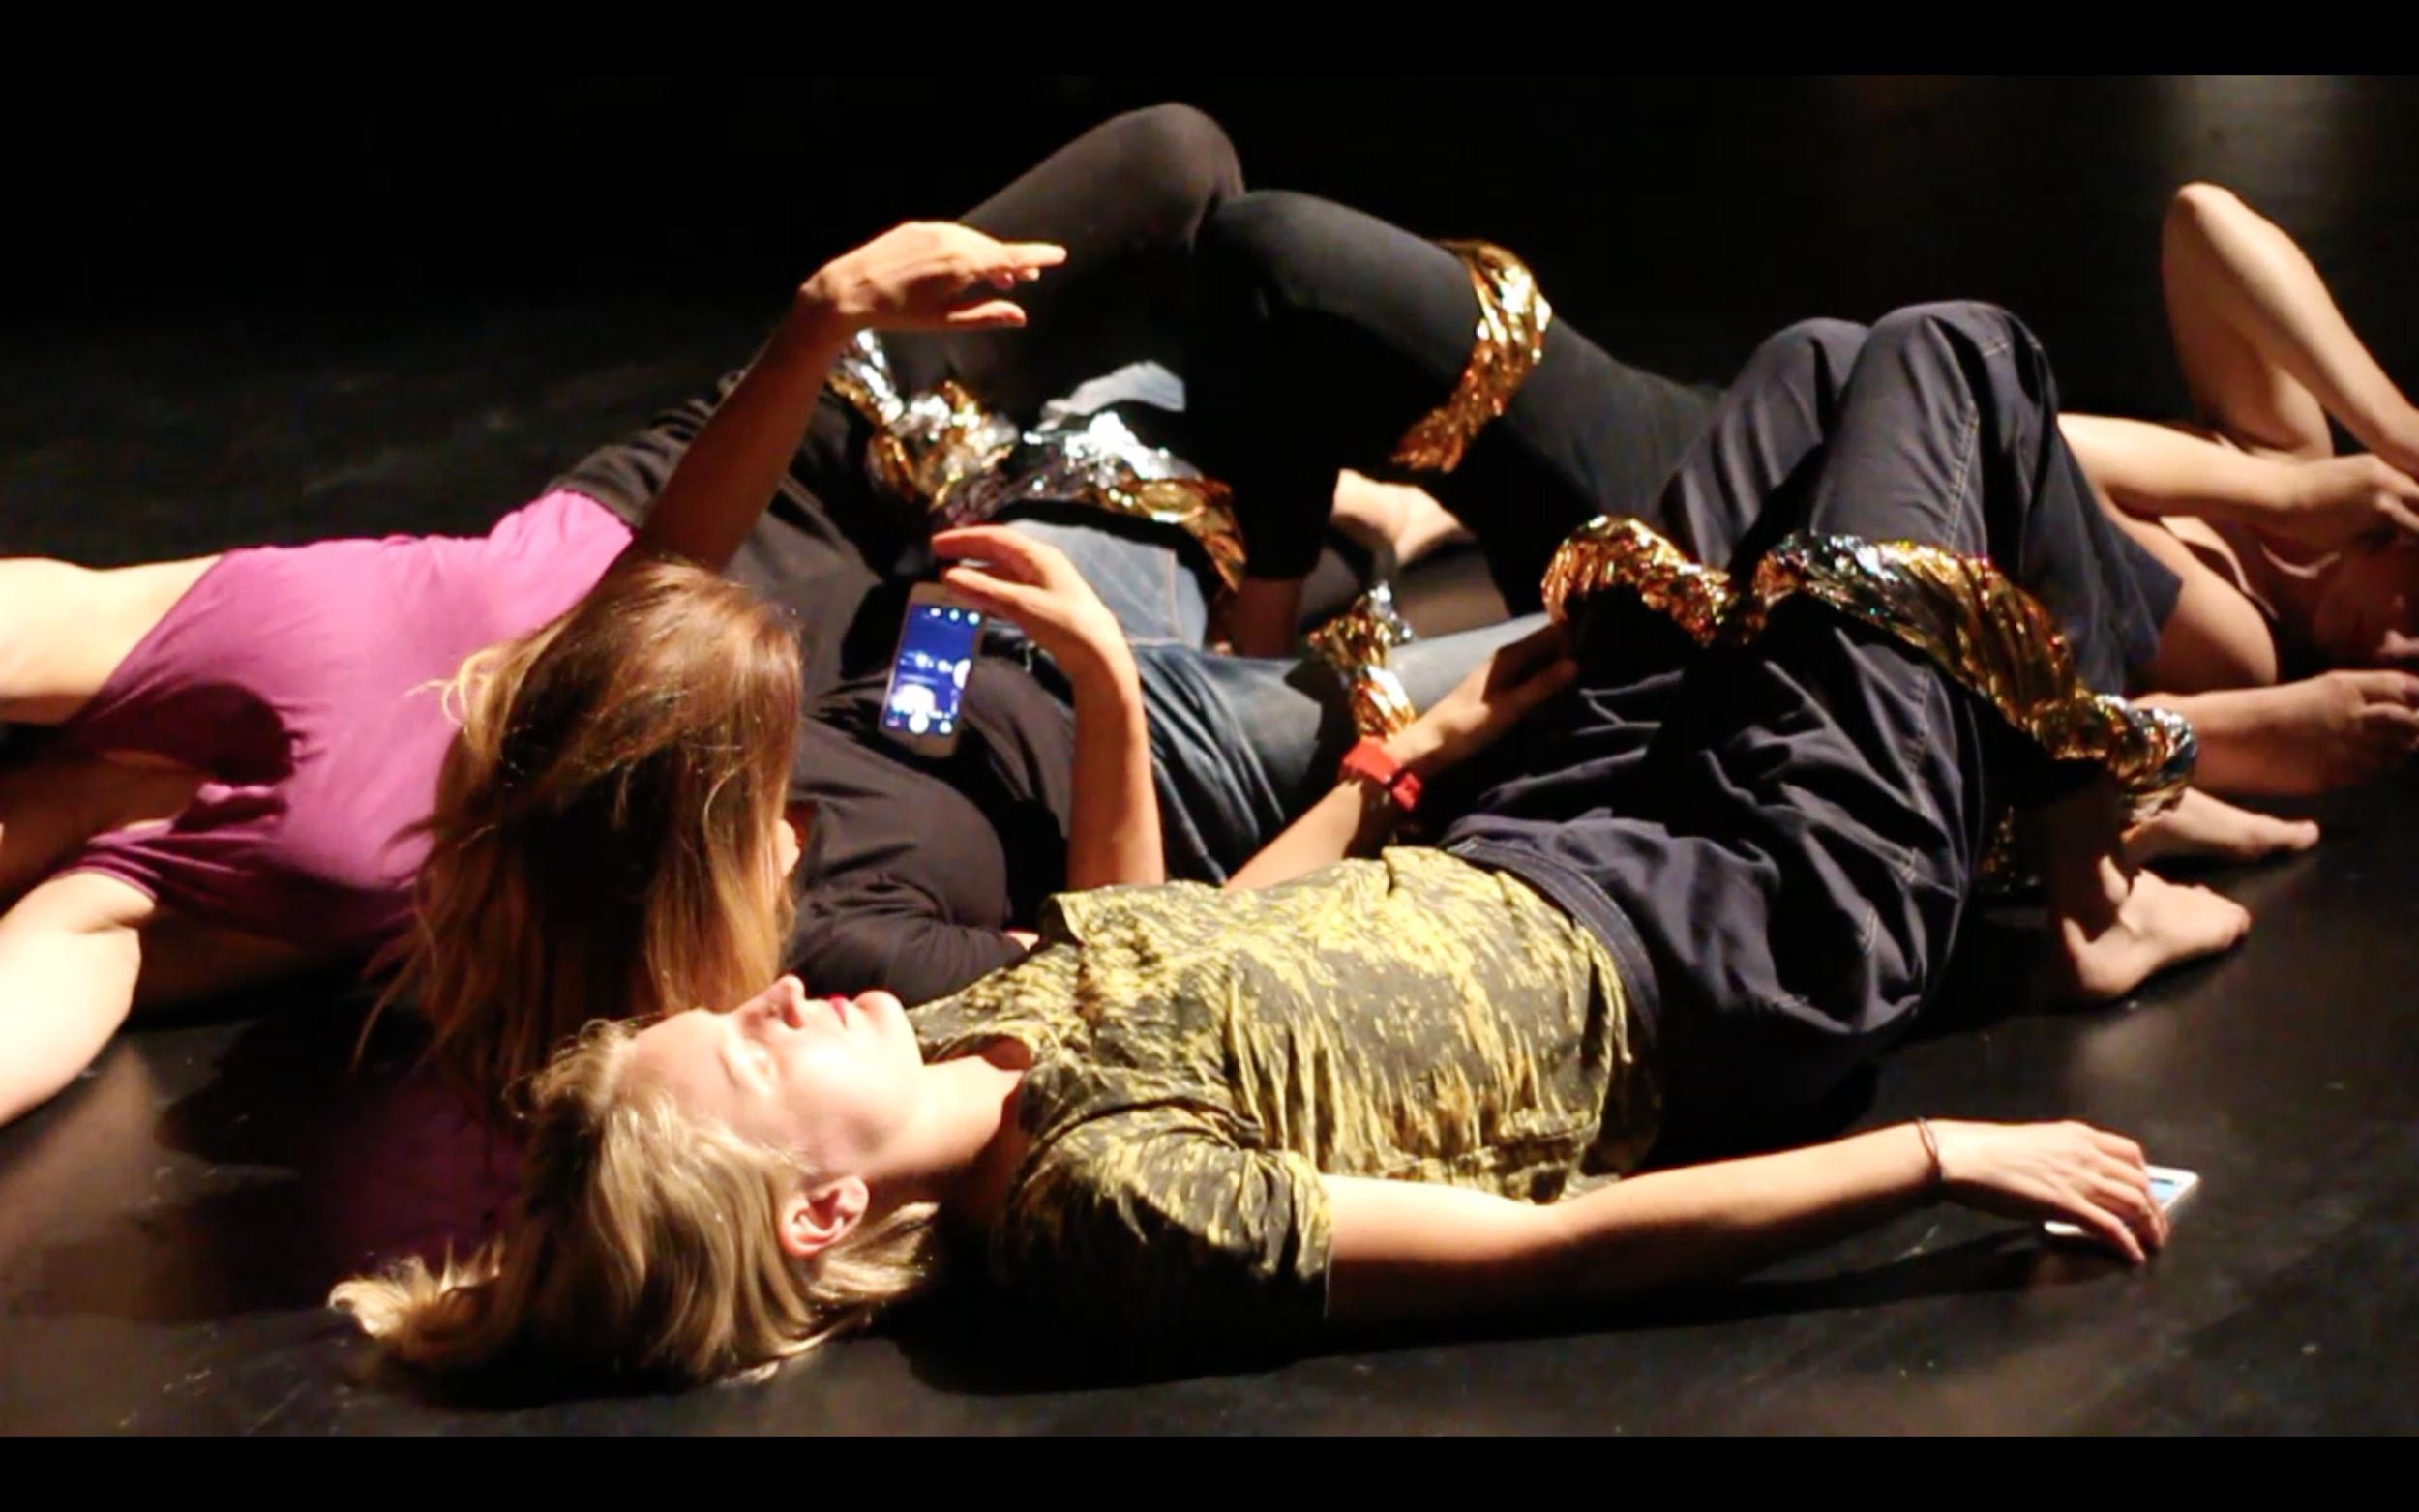 Copy of 'Messy Emergency Selfies Huddle' Andrea Haenggi